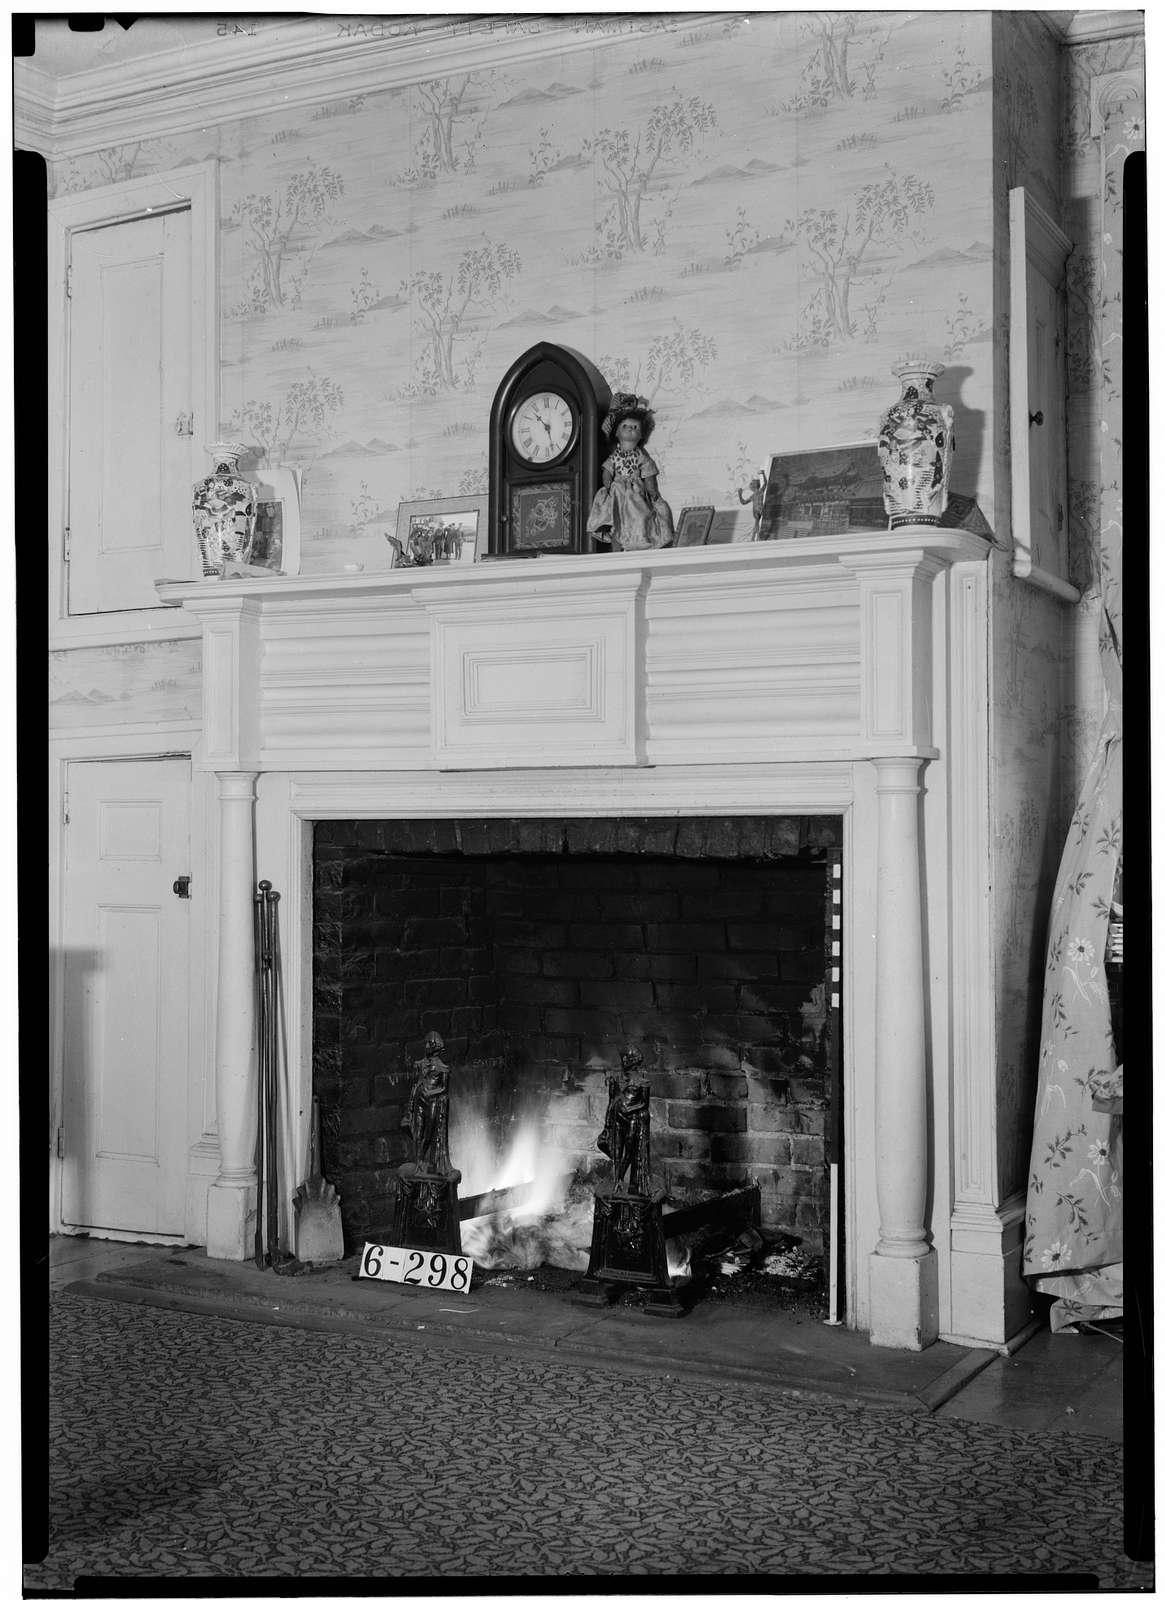 John Ackerman House, 1286 River Road, Teaneck, Bergen County, NJ